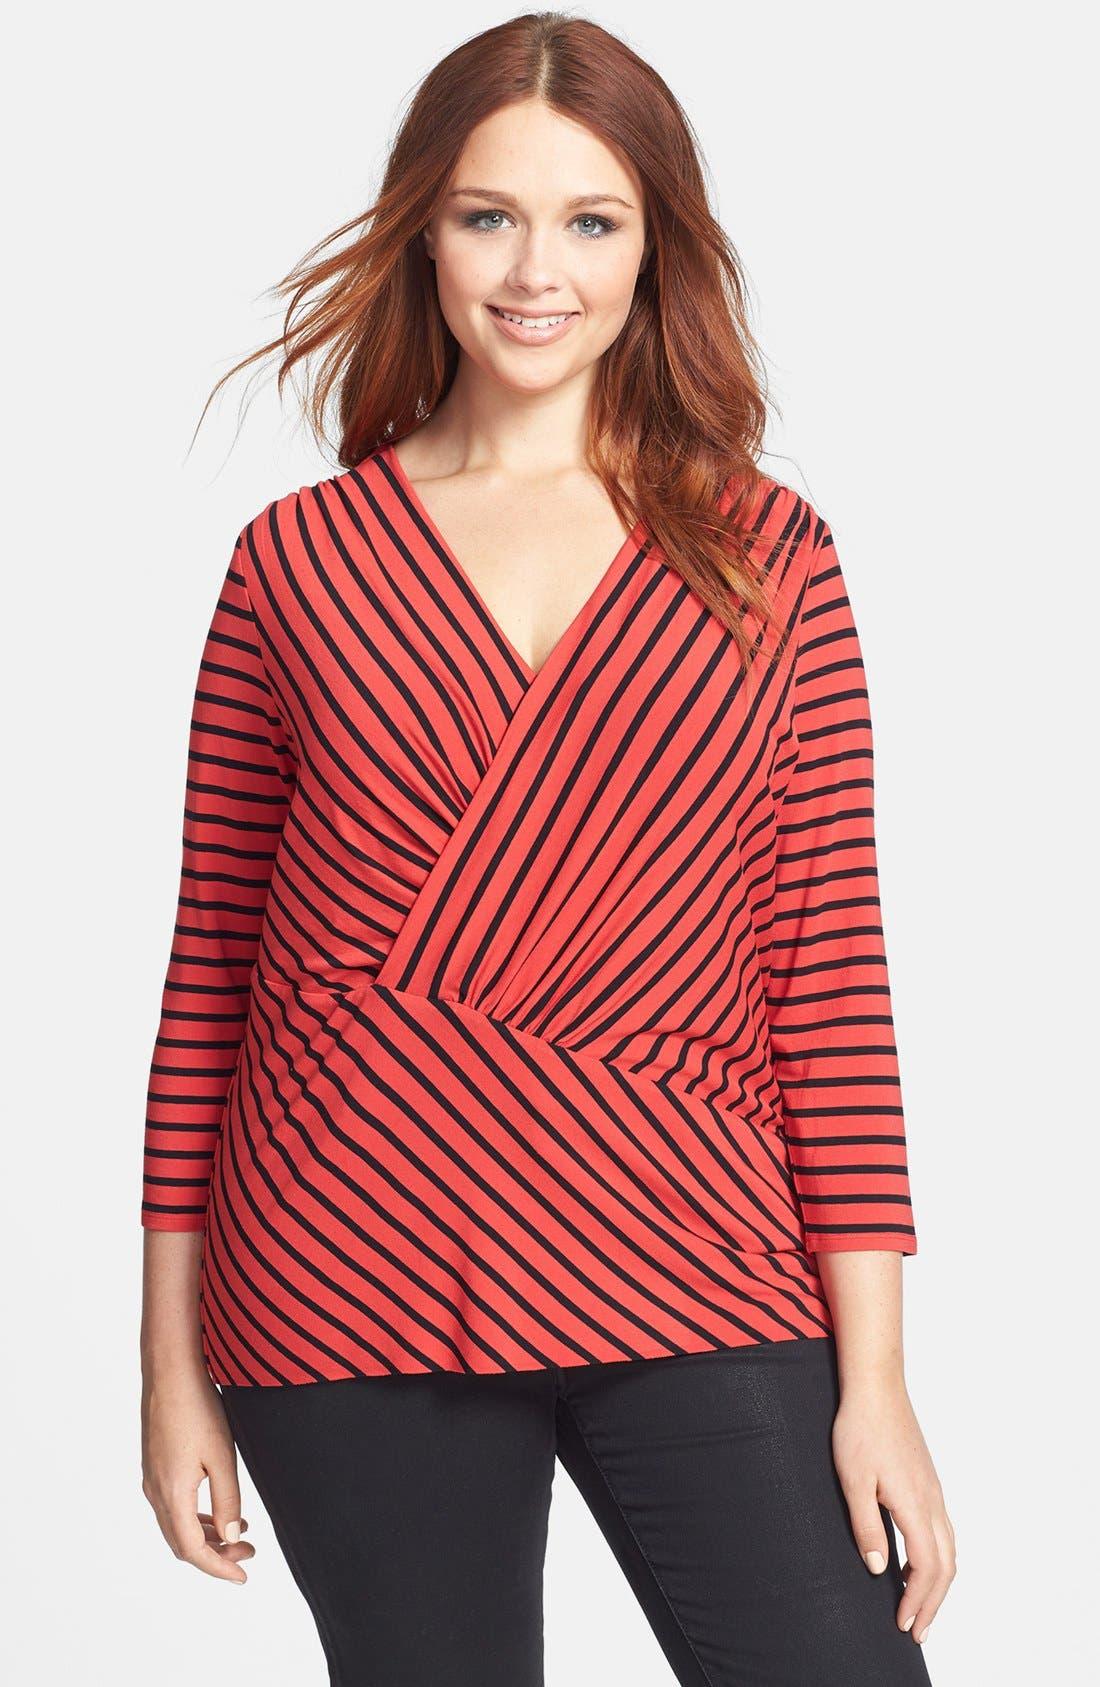 Main Image - Vince Camuto 'Retro Stripes' Asymmetrical Tunic (Plus Size)